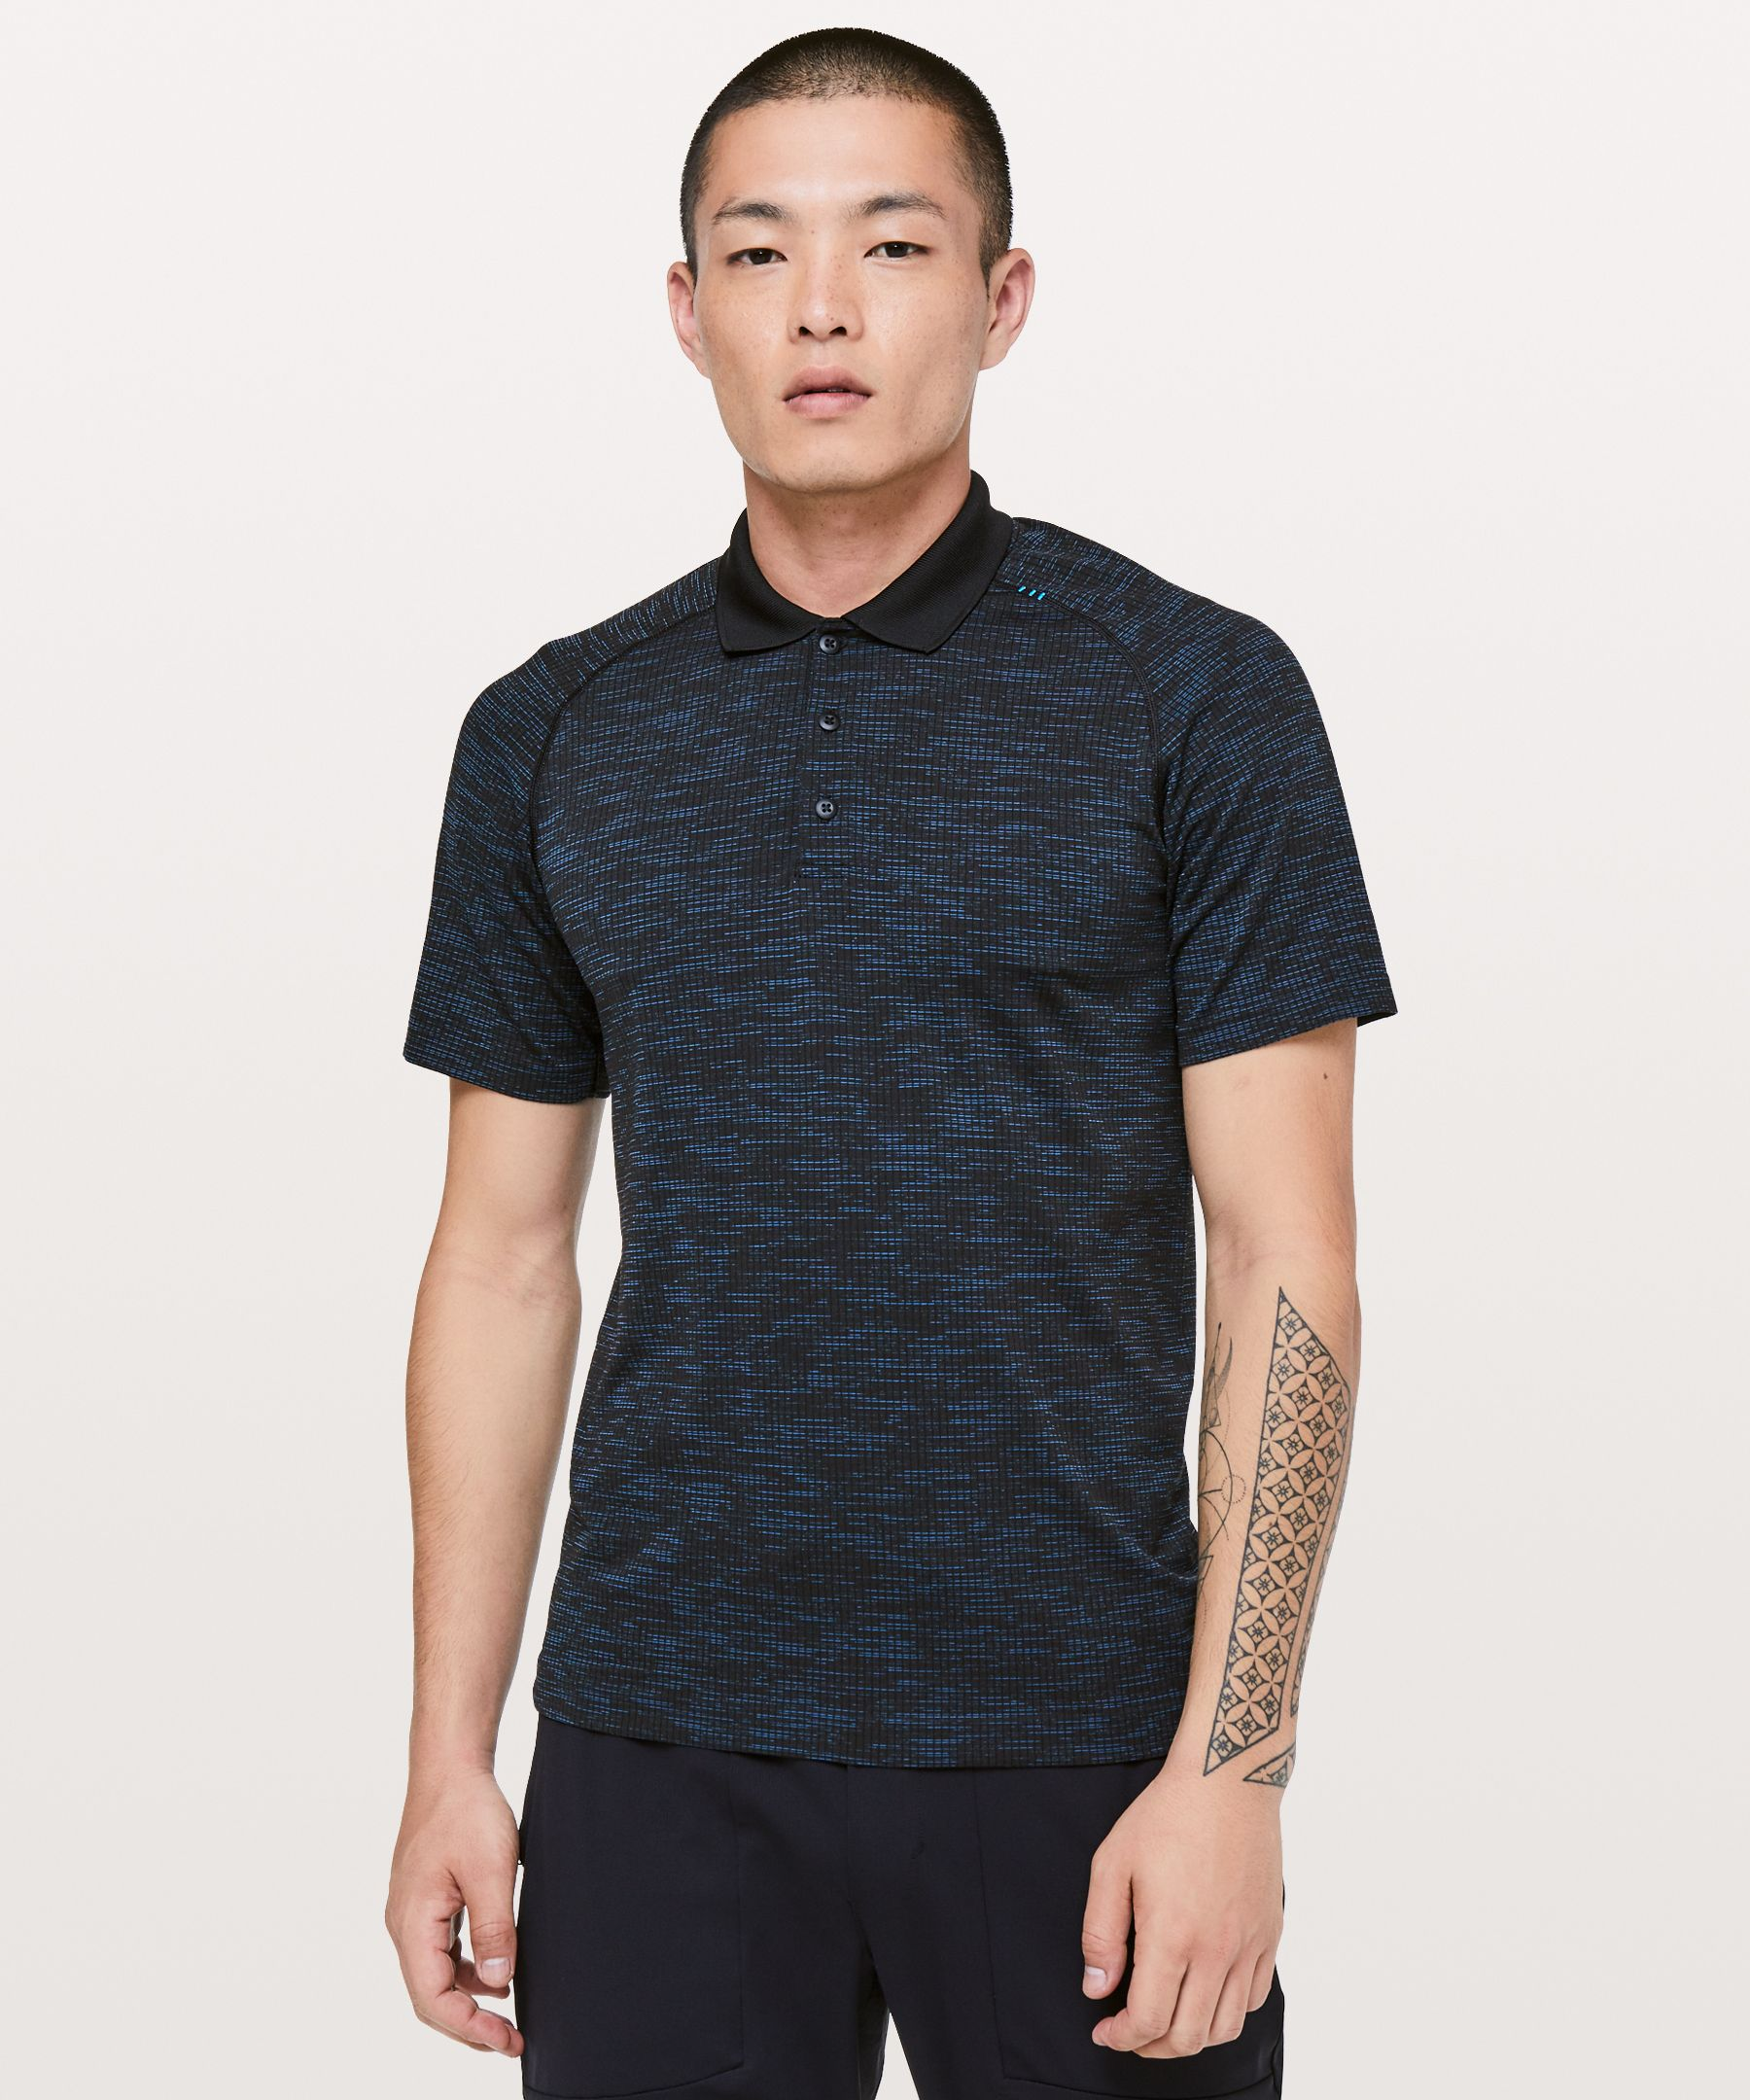 black and gold polo shirt mens purple swim shorts